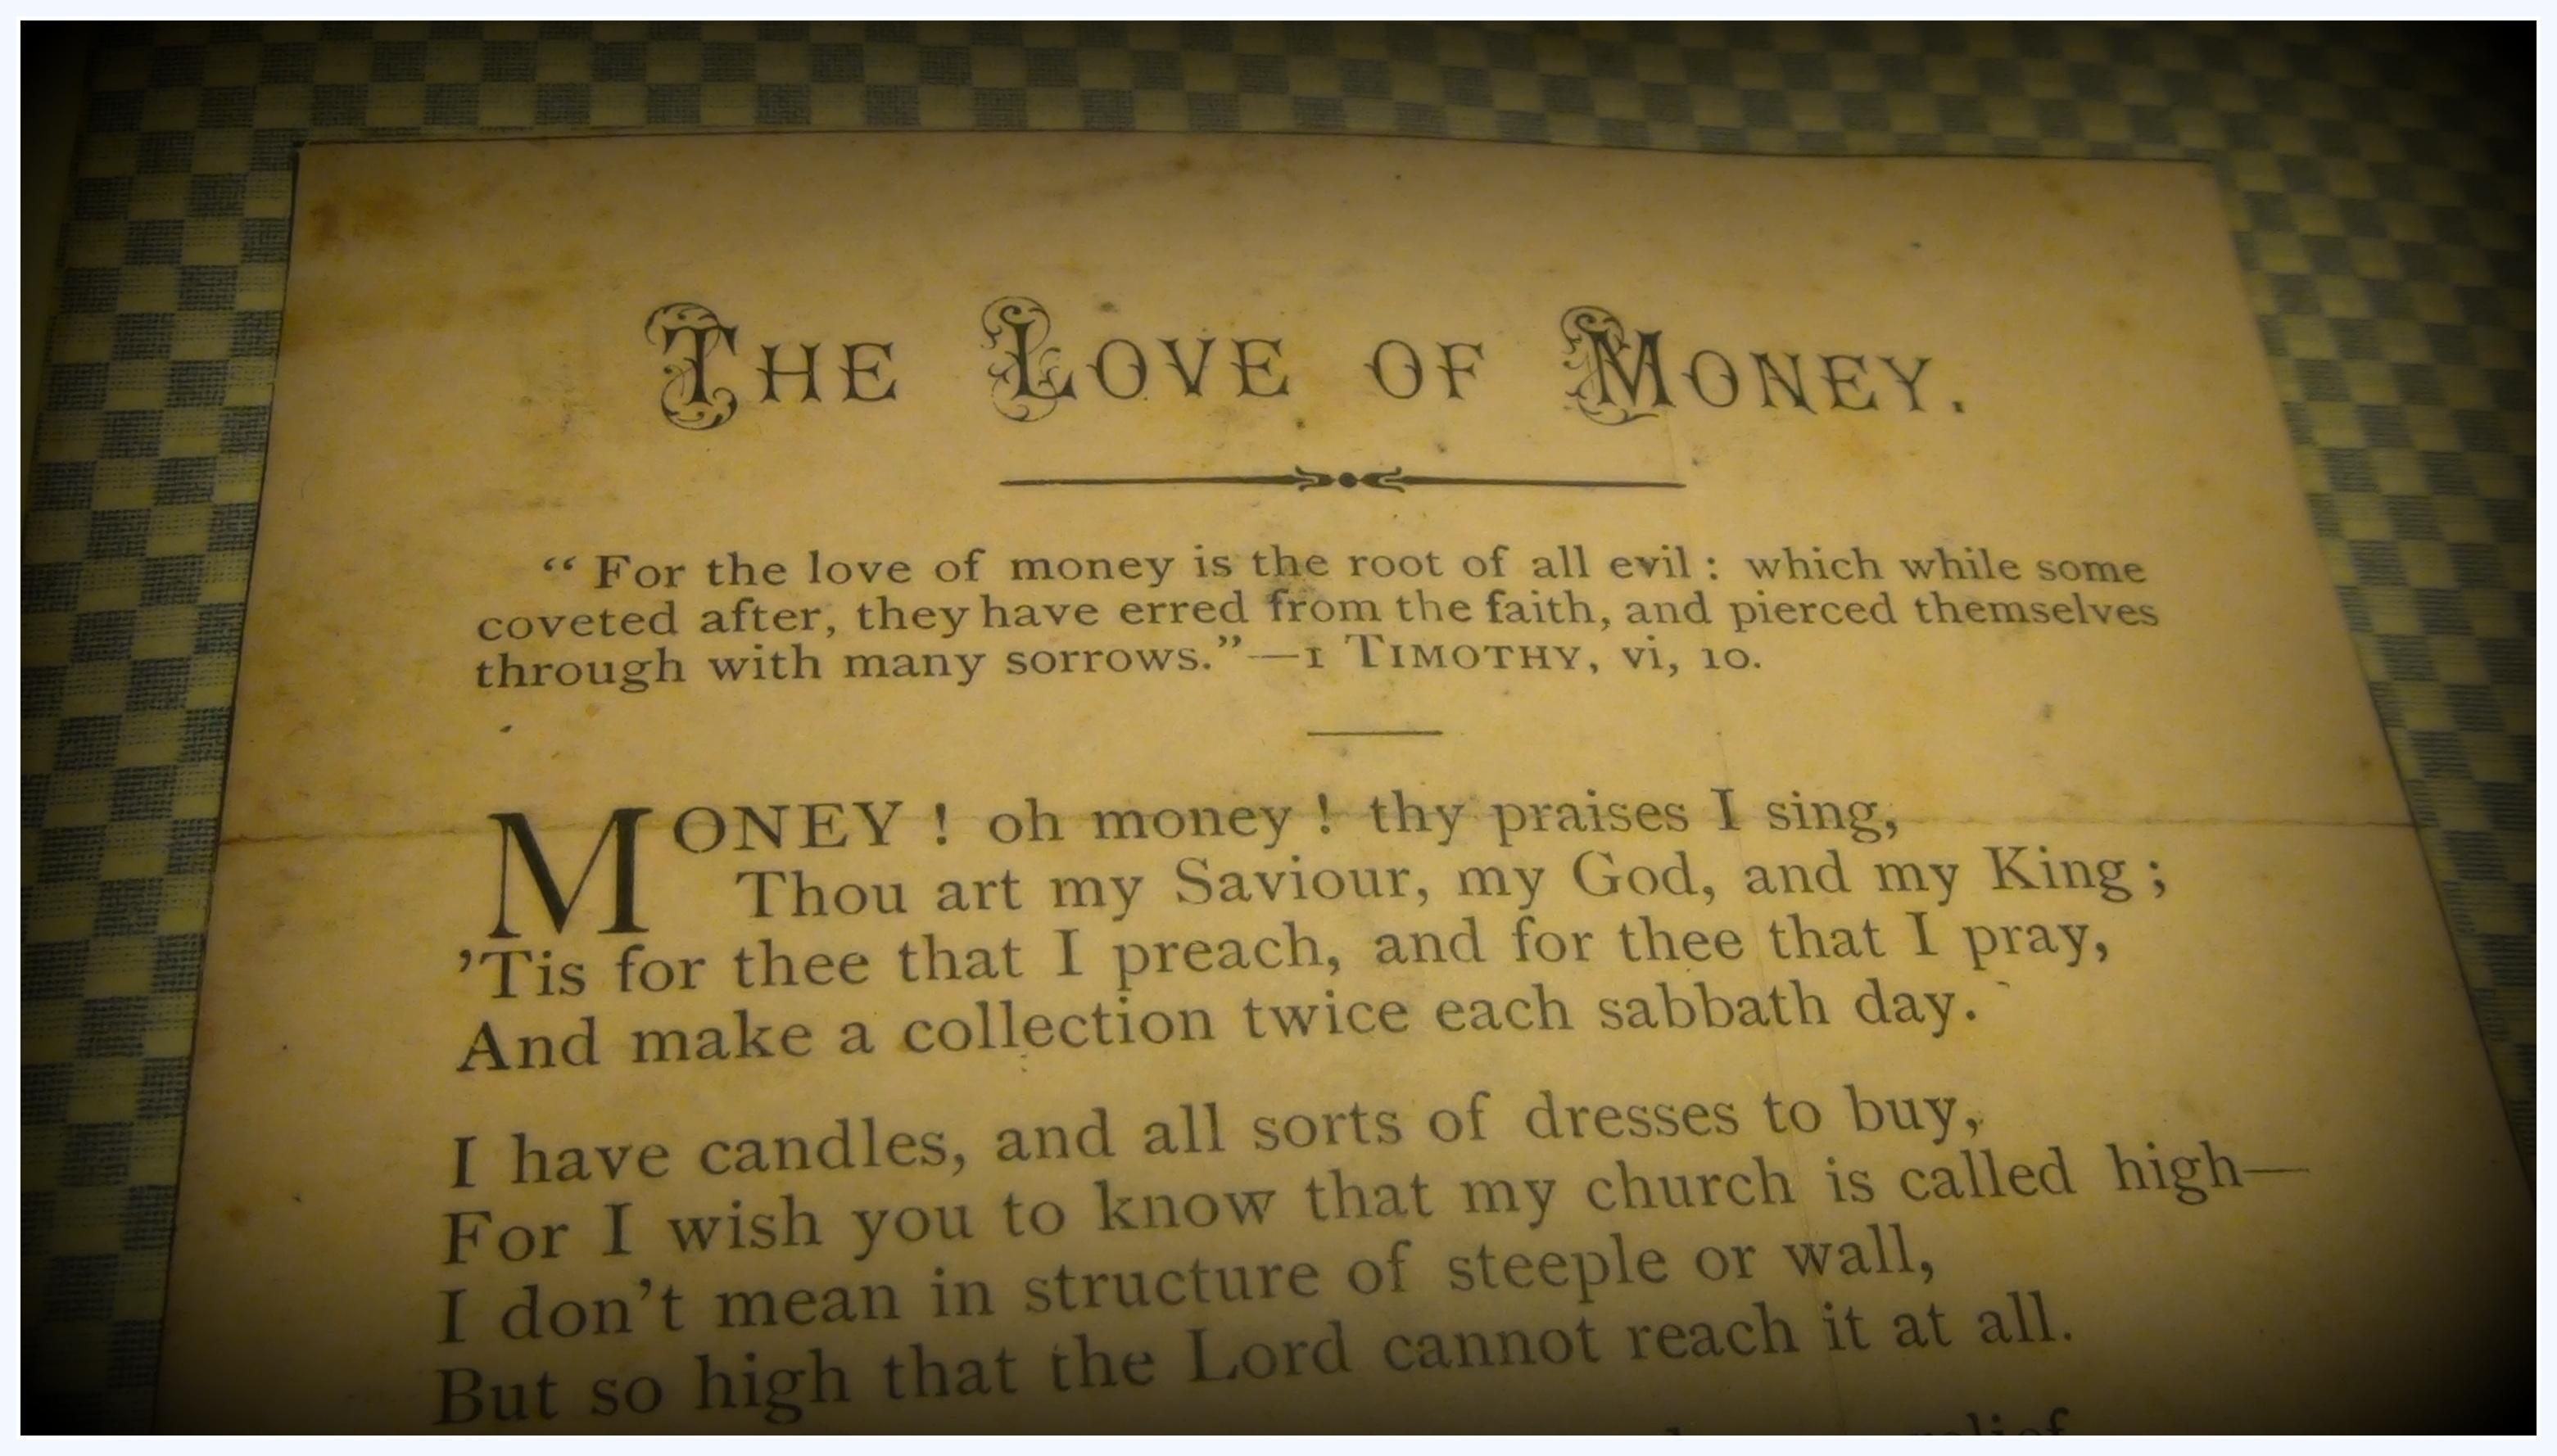 the-love-of-money-2016-simon-peter-sutherland